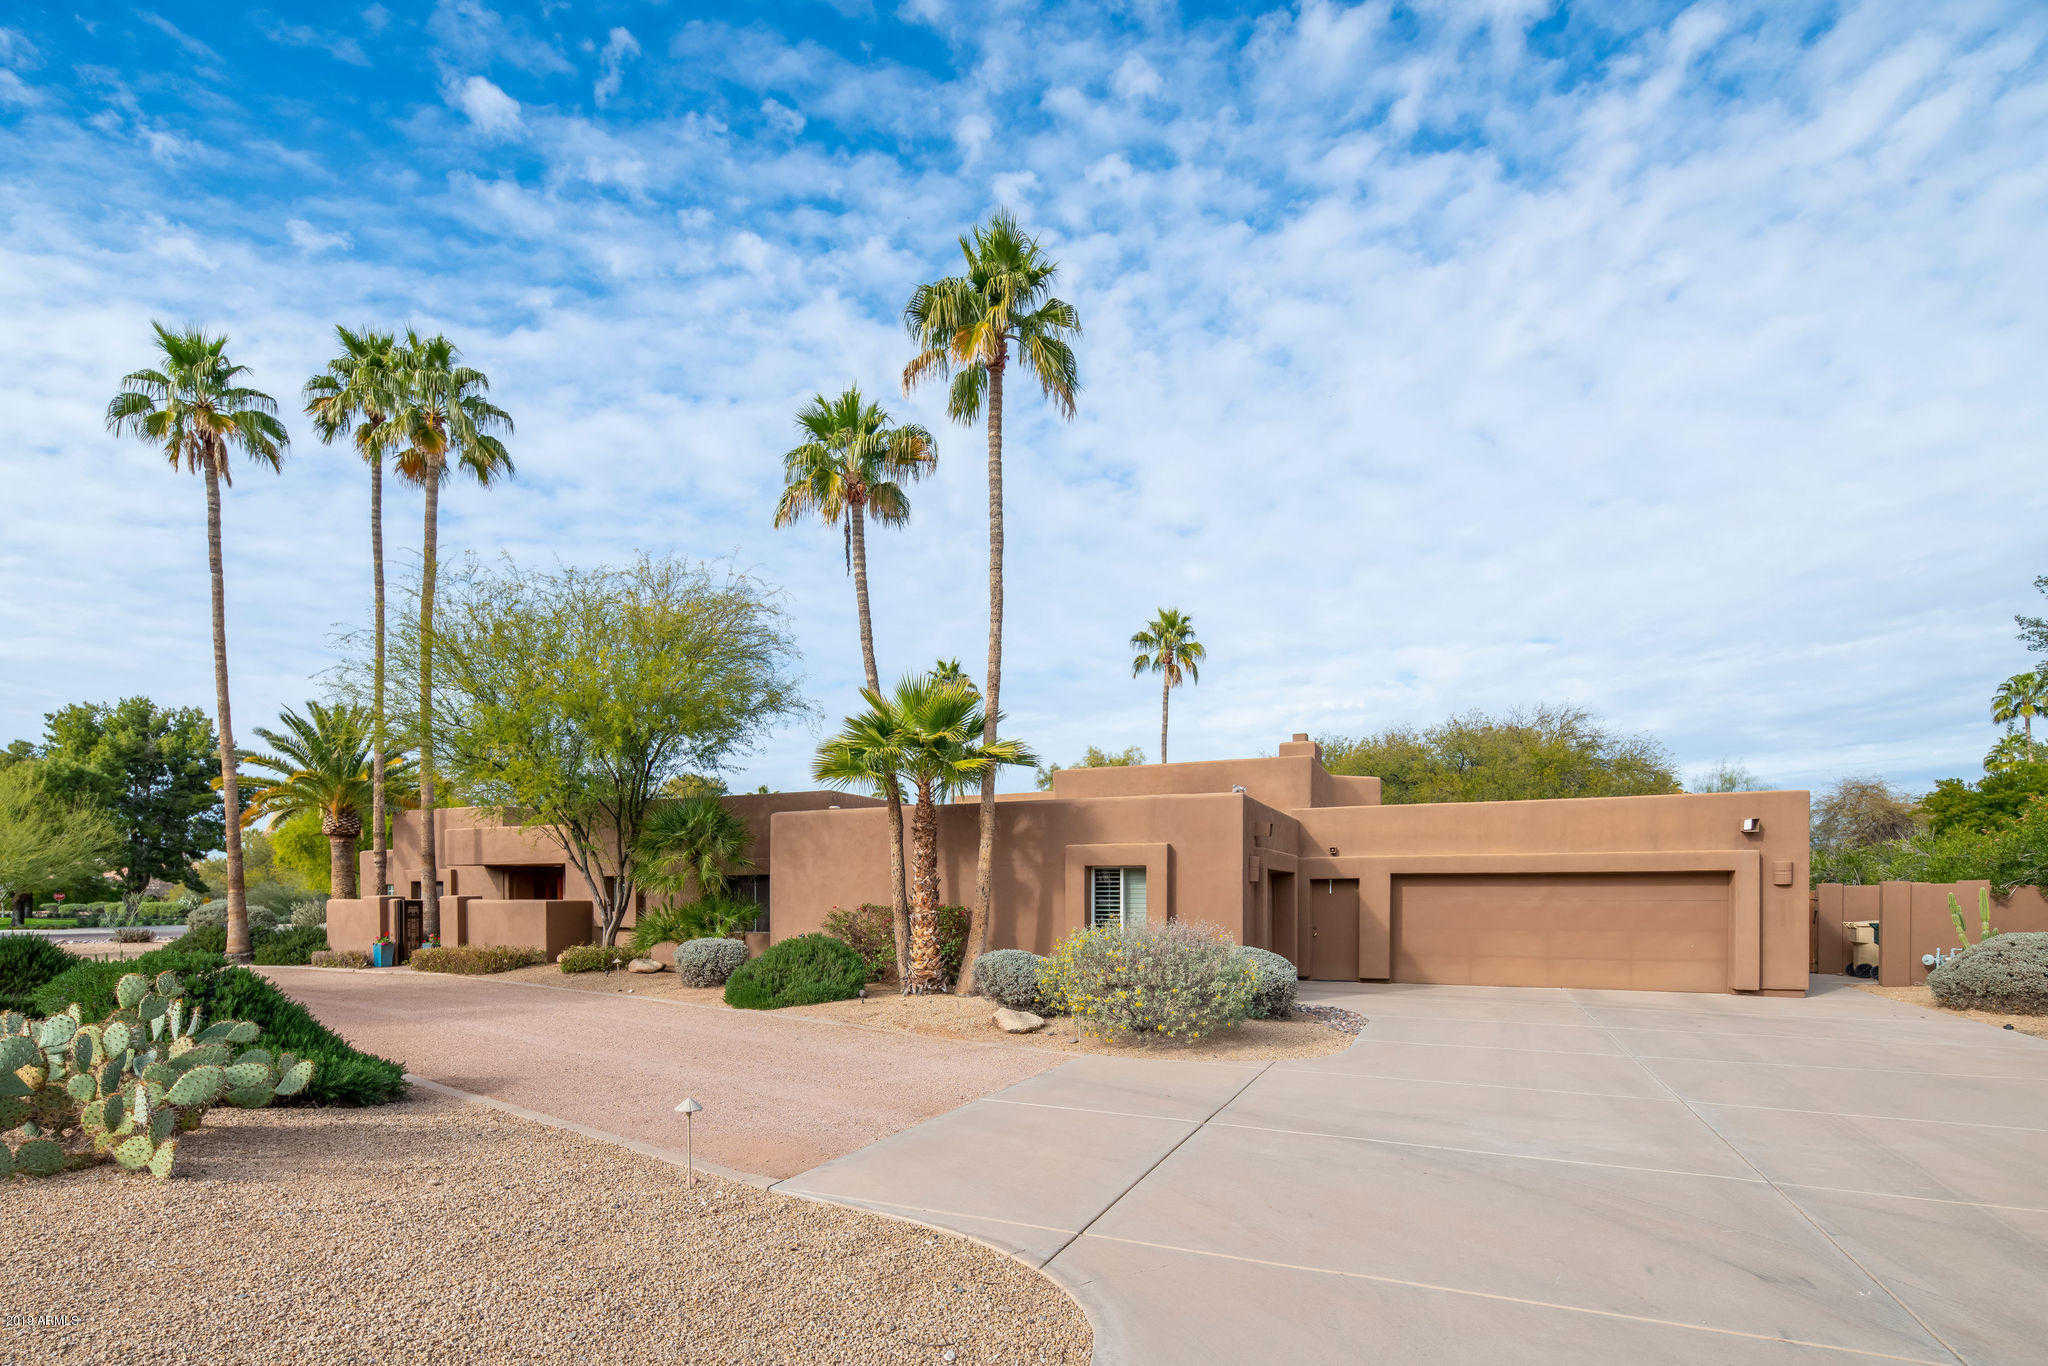 $1,450,000 - 4Br/4Ba - Home for Sale in Mockingbird Lane Estates 2, Paradise Valley